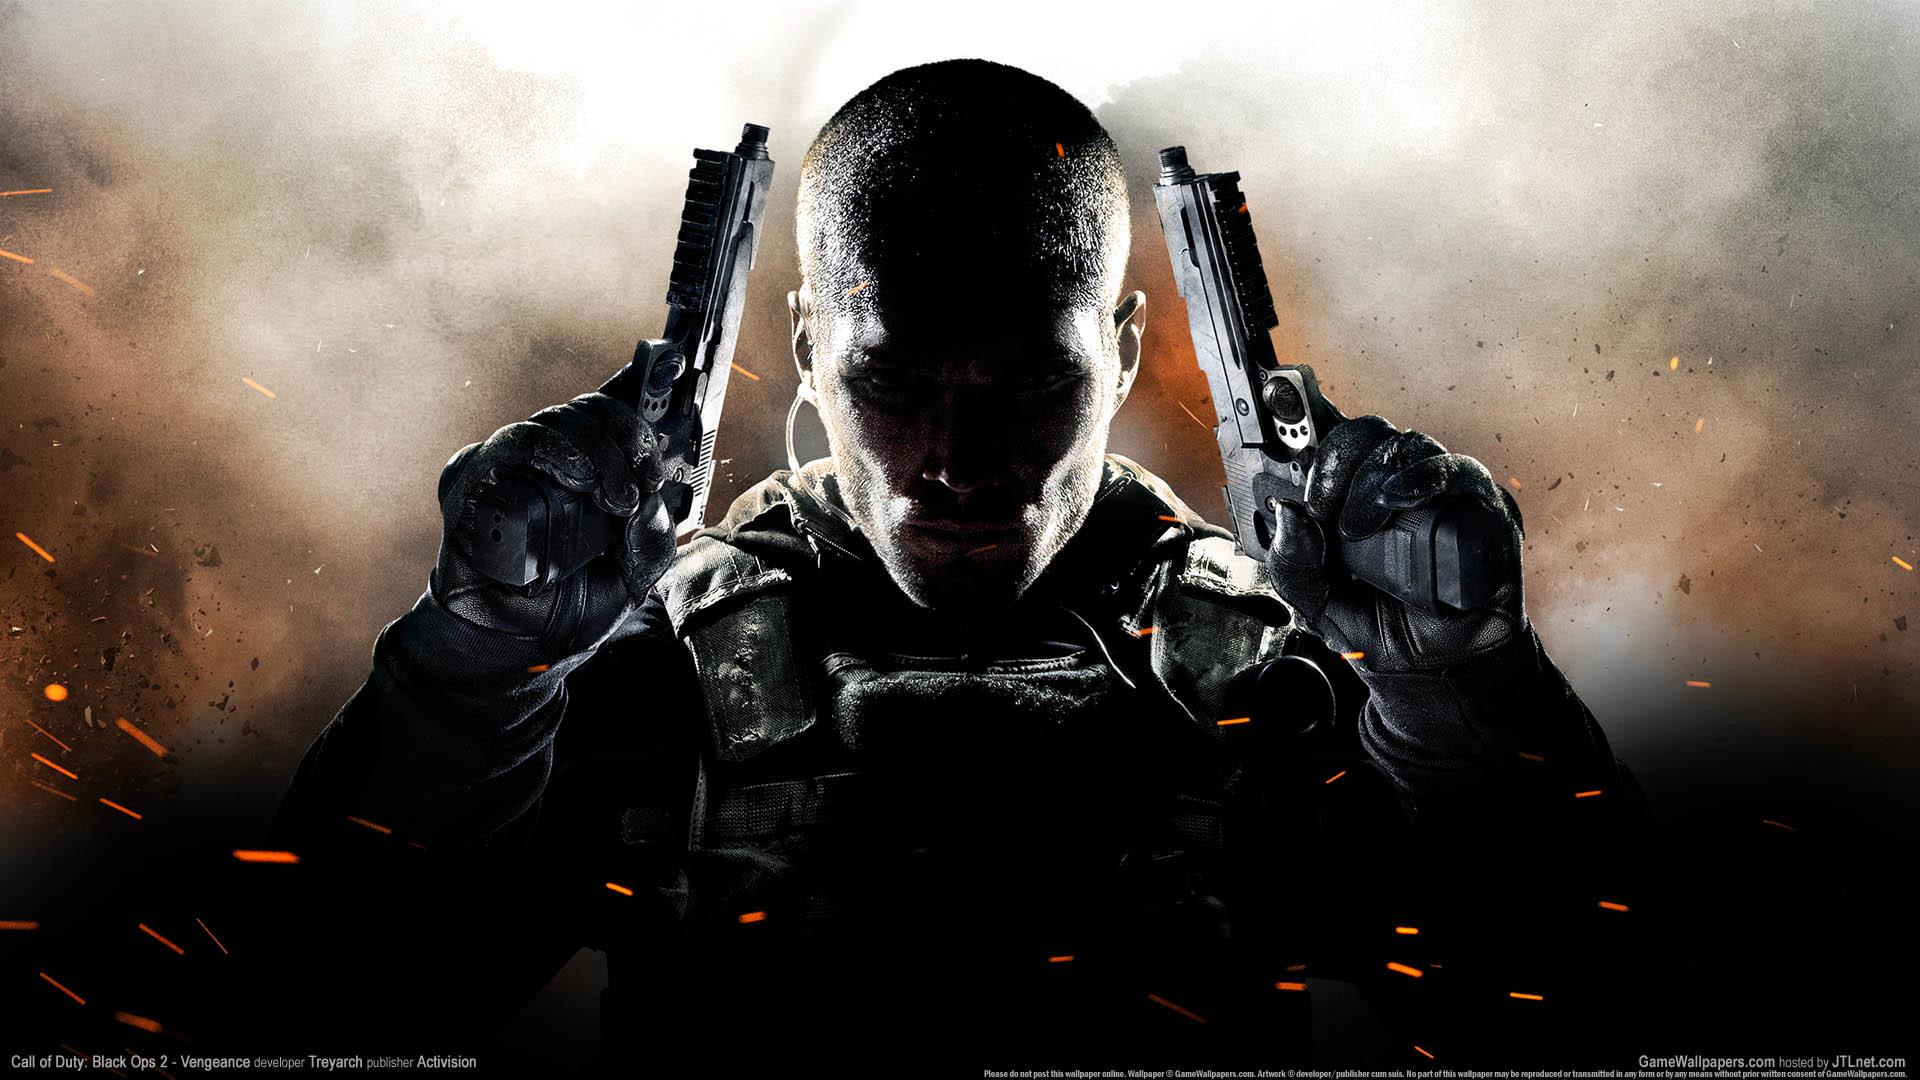 Call Of Duty Black Ops 2 Vengeance Fondo De Escritorio 01